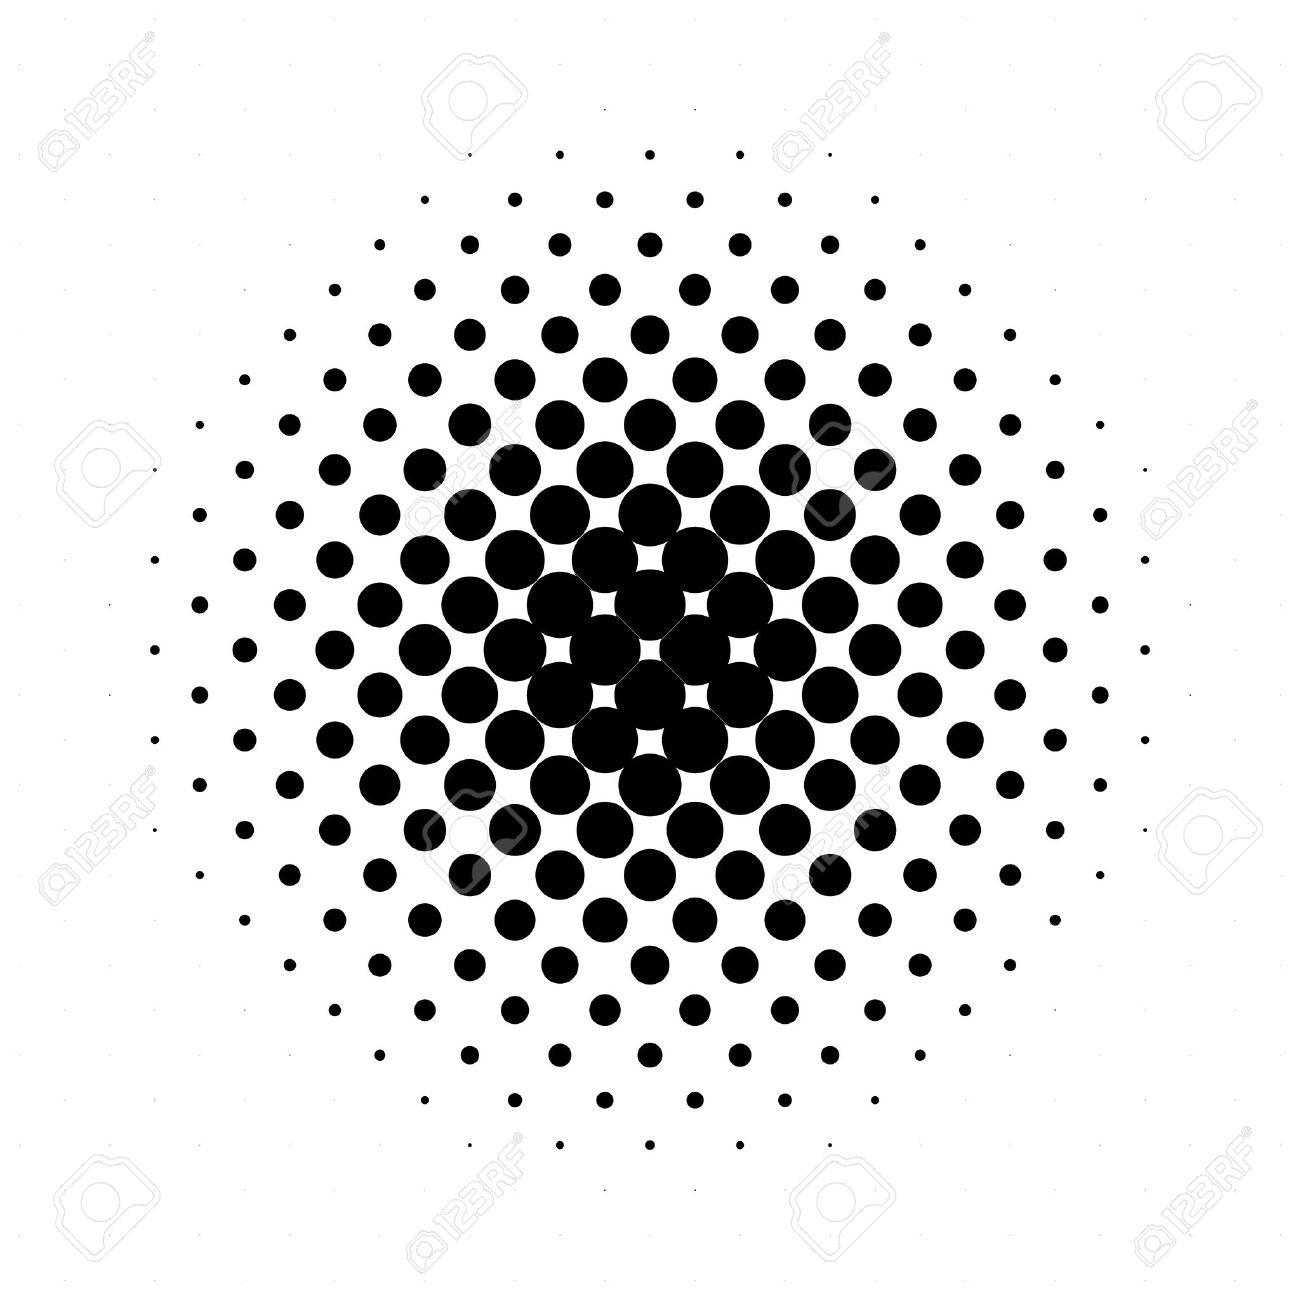 circle halftone pattern texture monochrome halftone dots royalty rh 123rf com Scalloped Circle Clip Art Scalloped Circle Clip Art